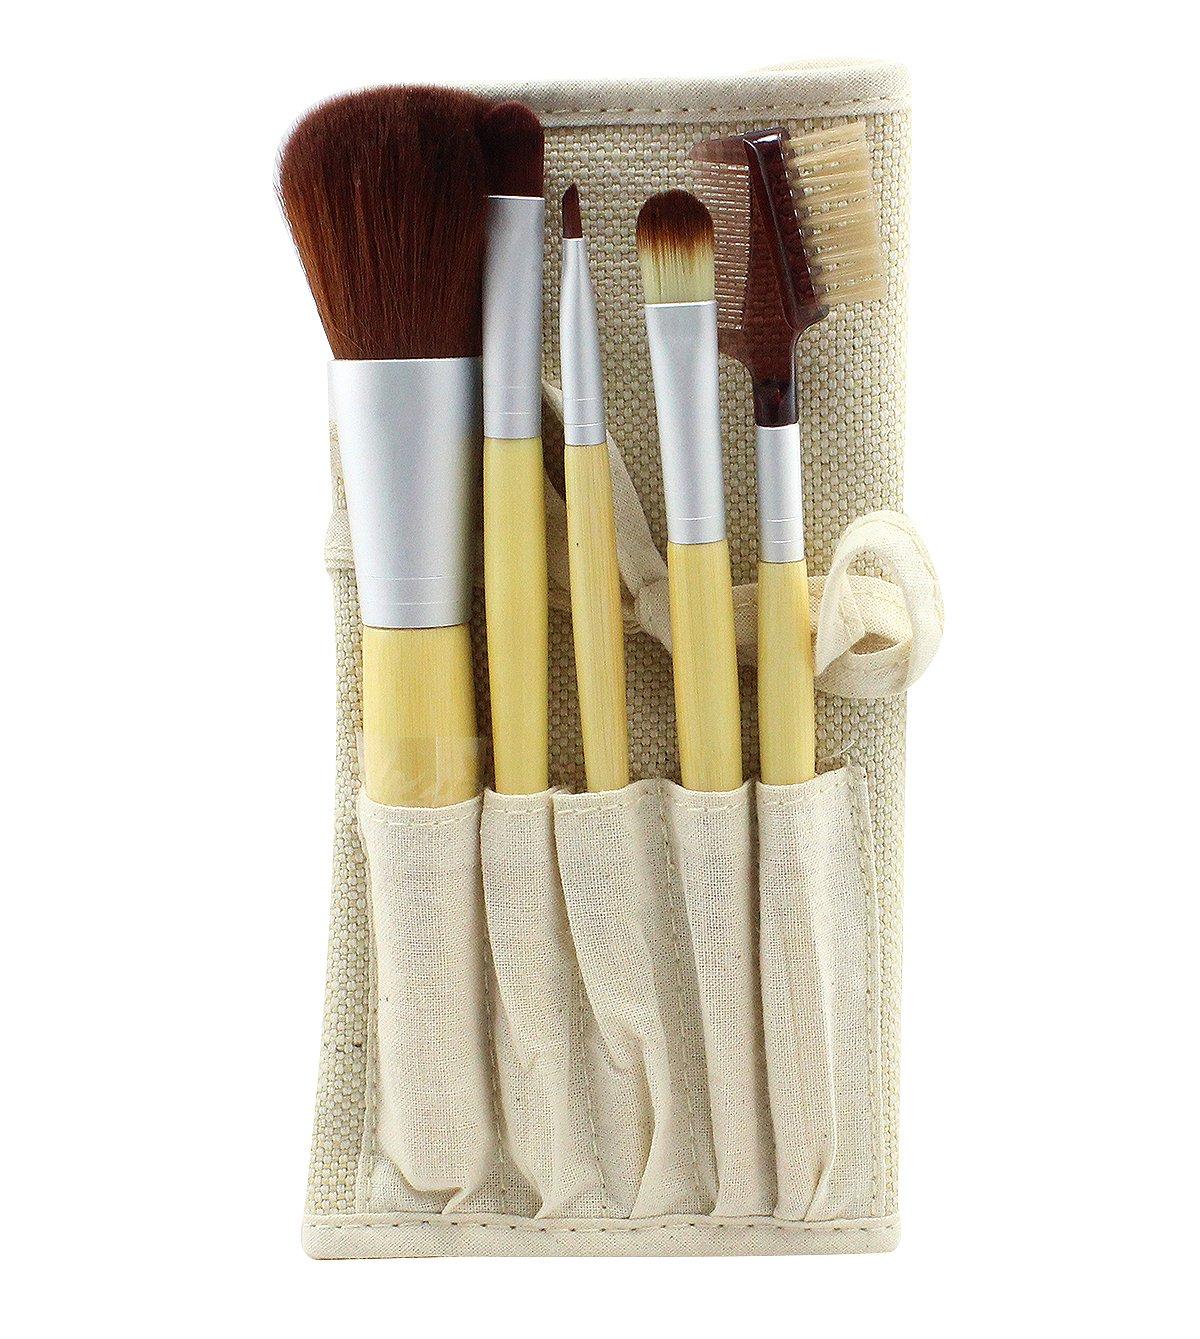 CALA Naturale Womens Make-Up 5pc. Bamboo Brush Set